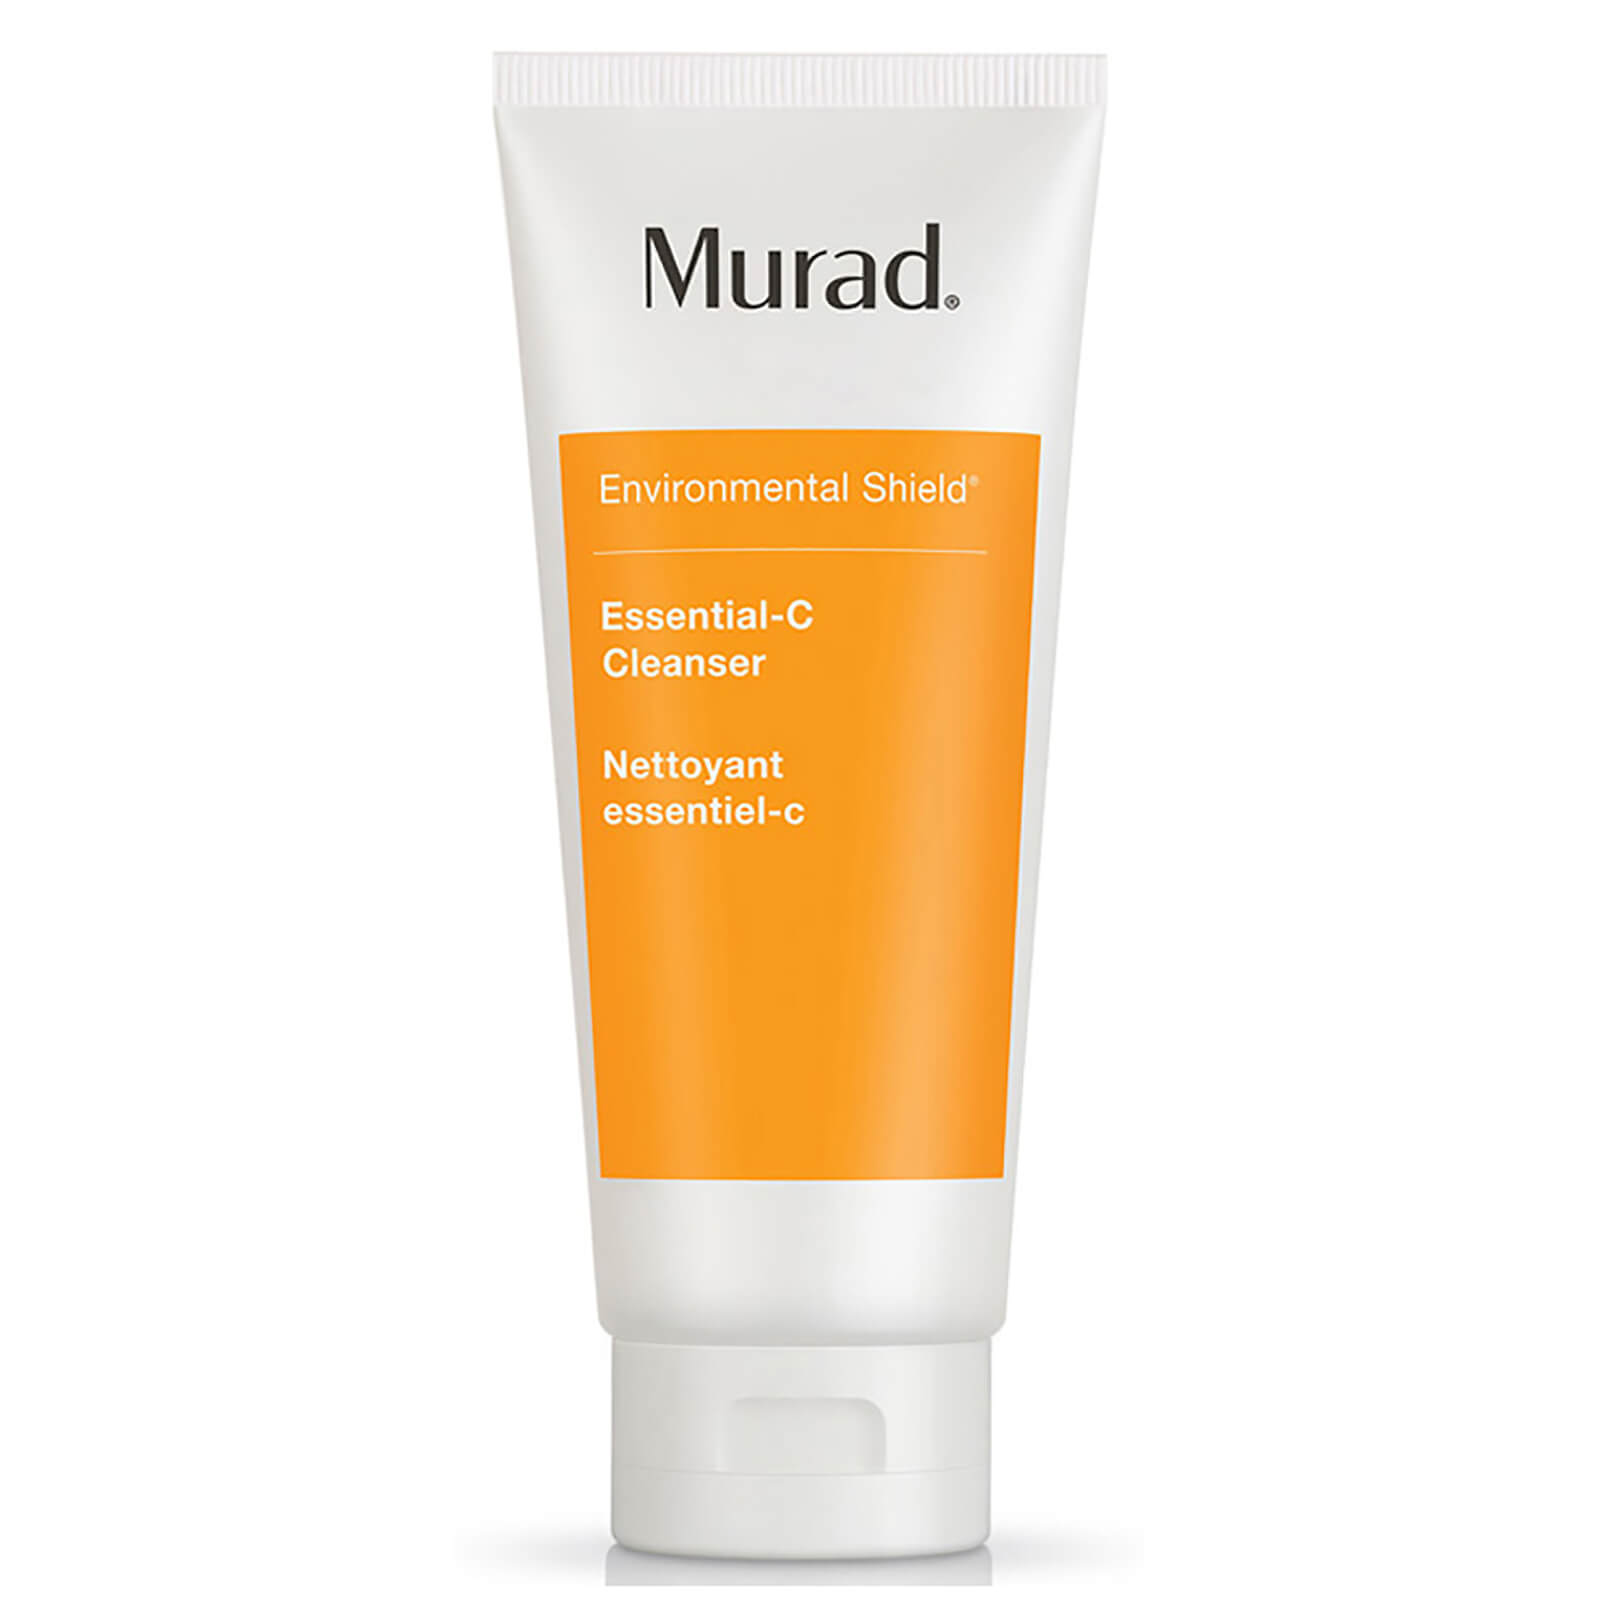 Murad Enivronmental Shield Essential C - Cleanser (200ml)